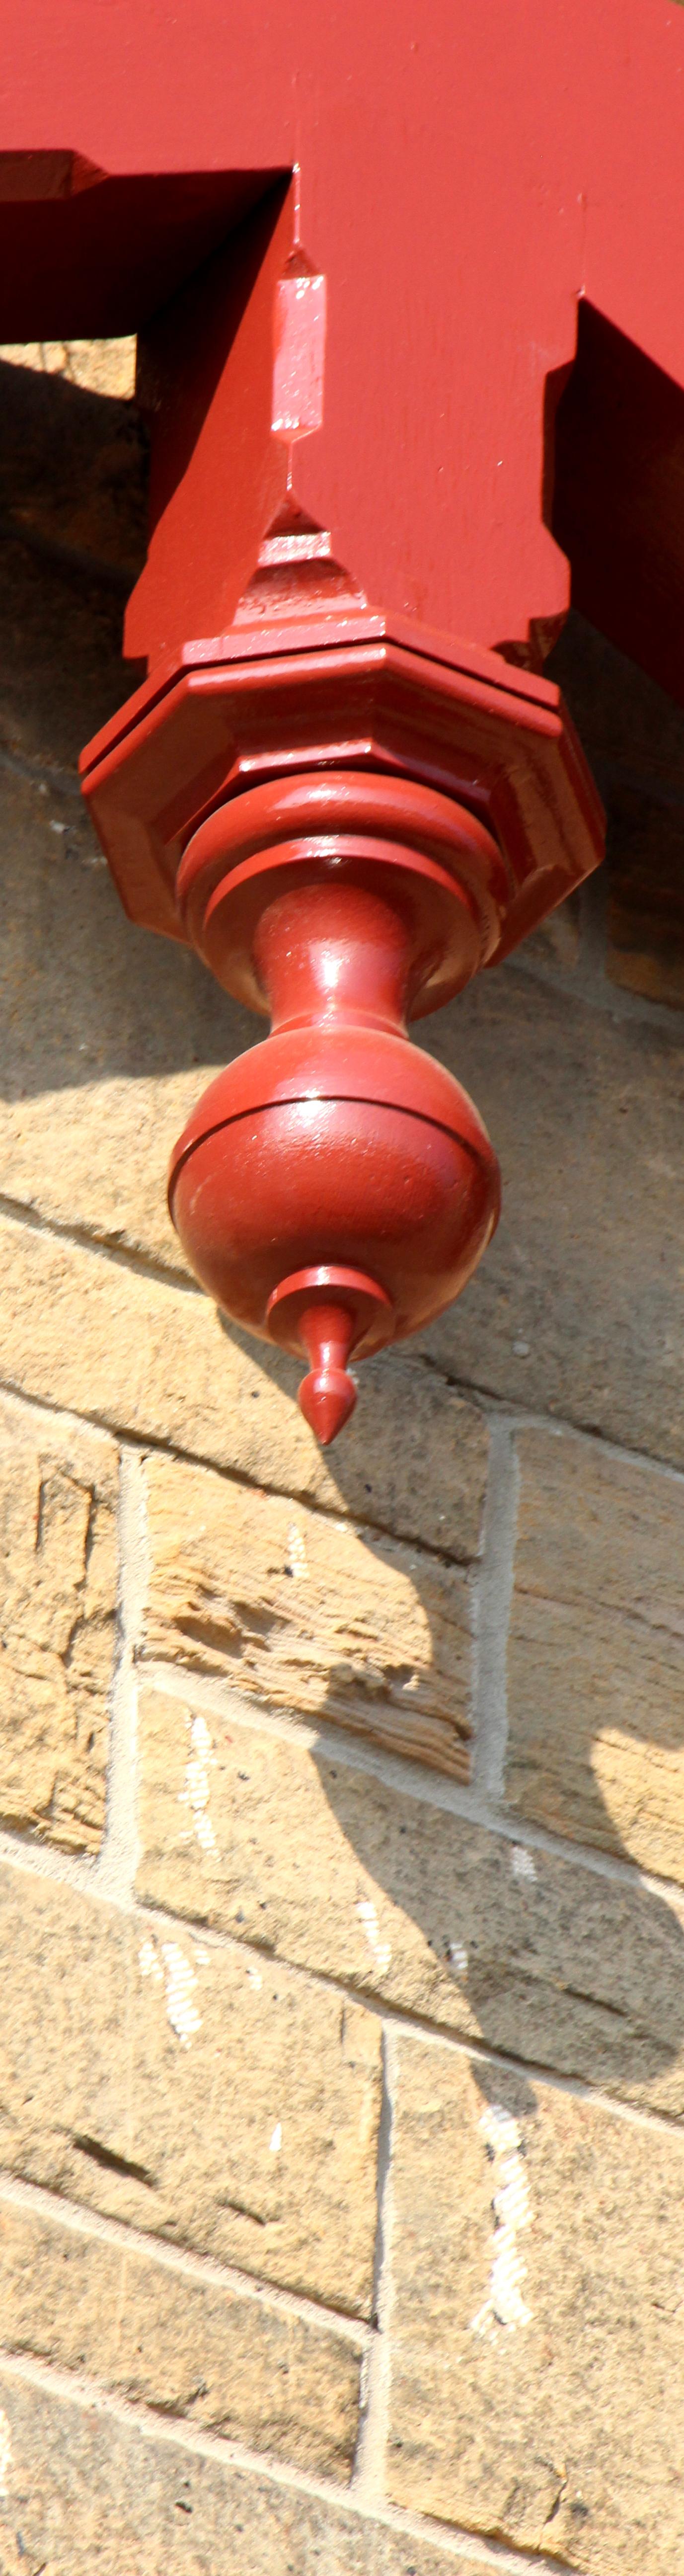 pendant finial, specialist joinery, reclaimed wood, restoration, Barnton Hotel, Scotland